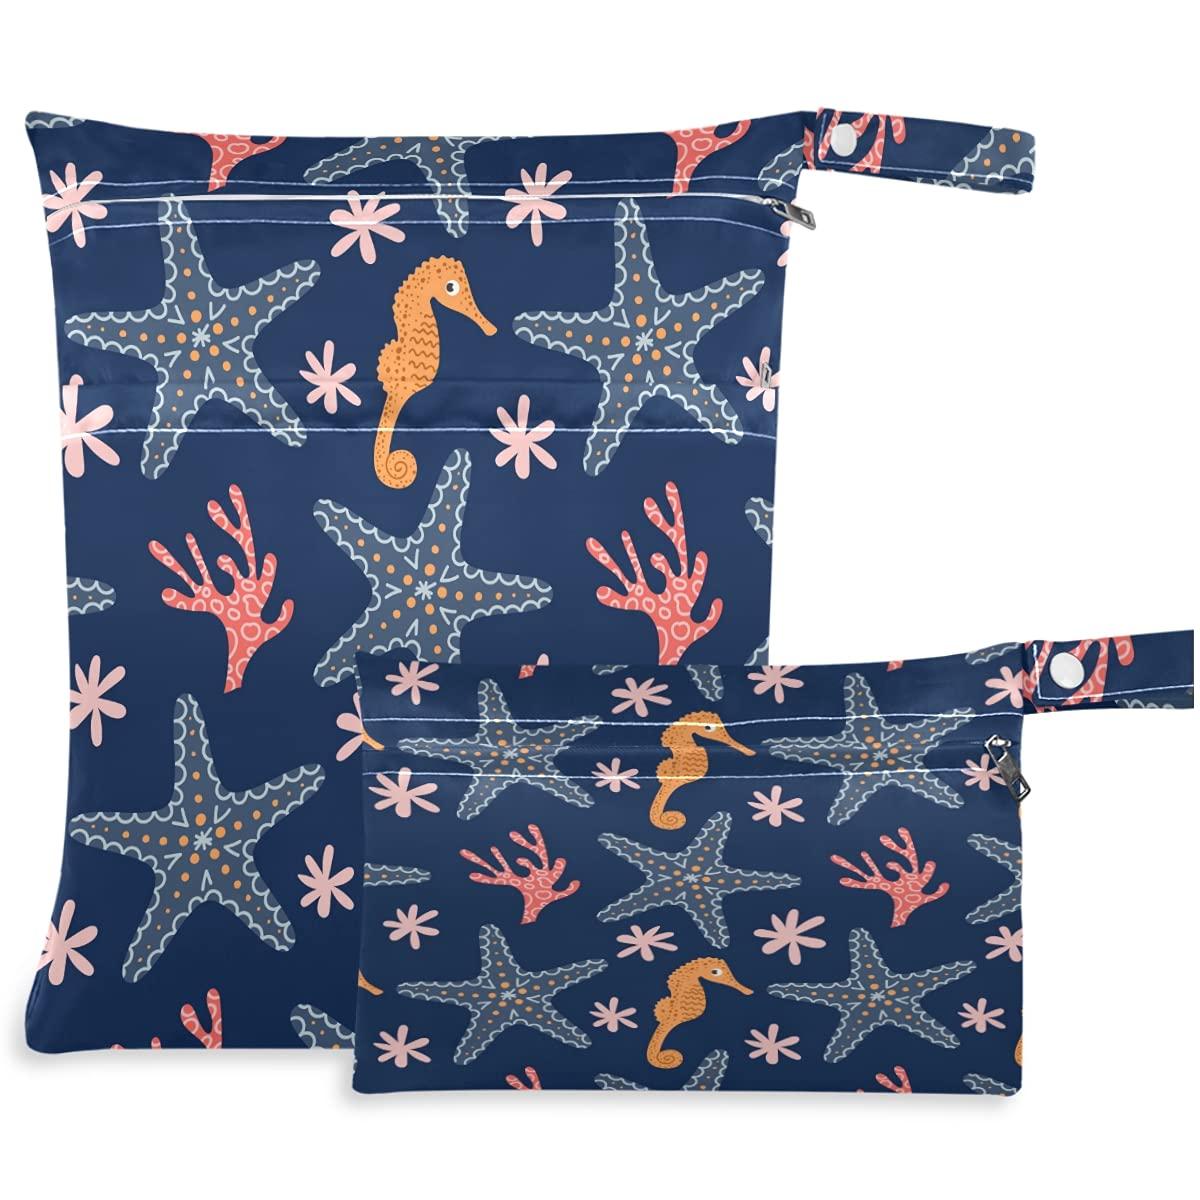 visesunny Marine Mail order Seamless Pattern Popular brand Starfish 2Pcs Seahorse Corals